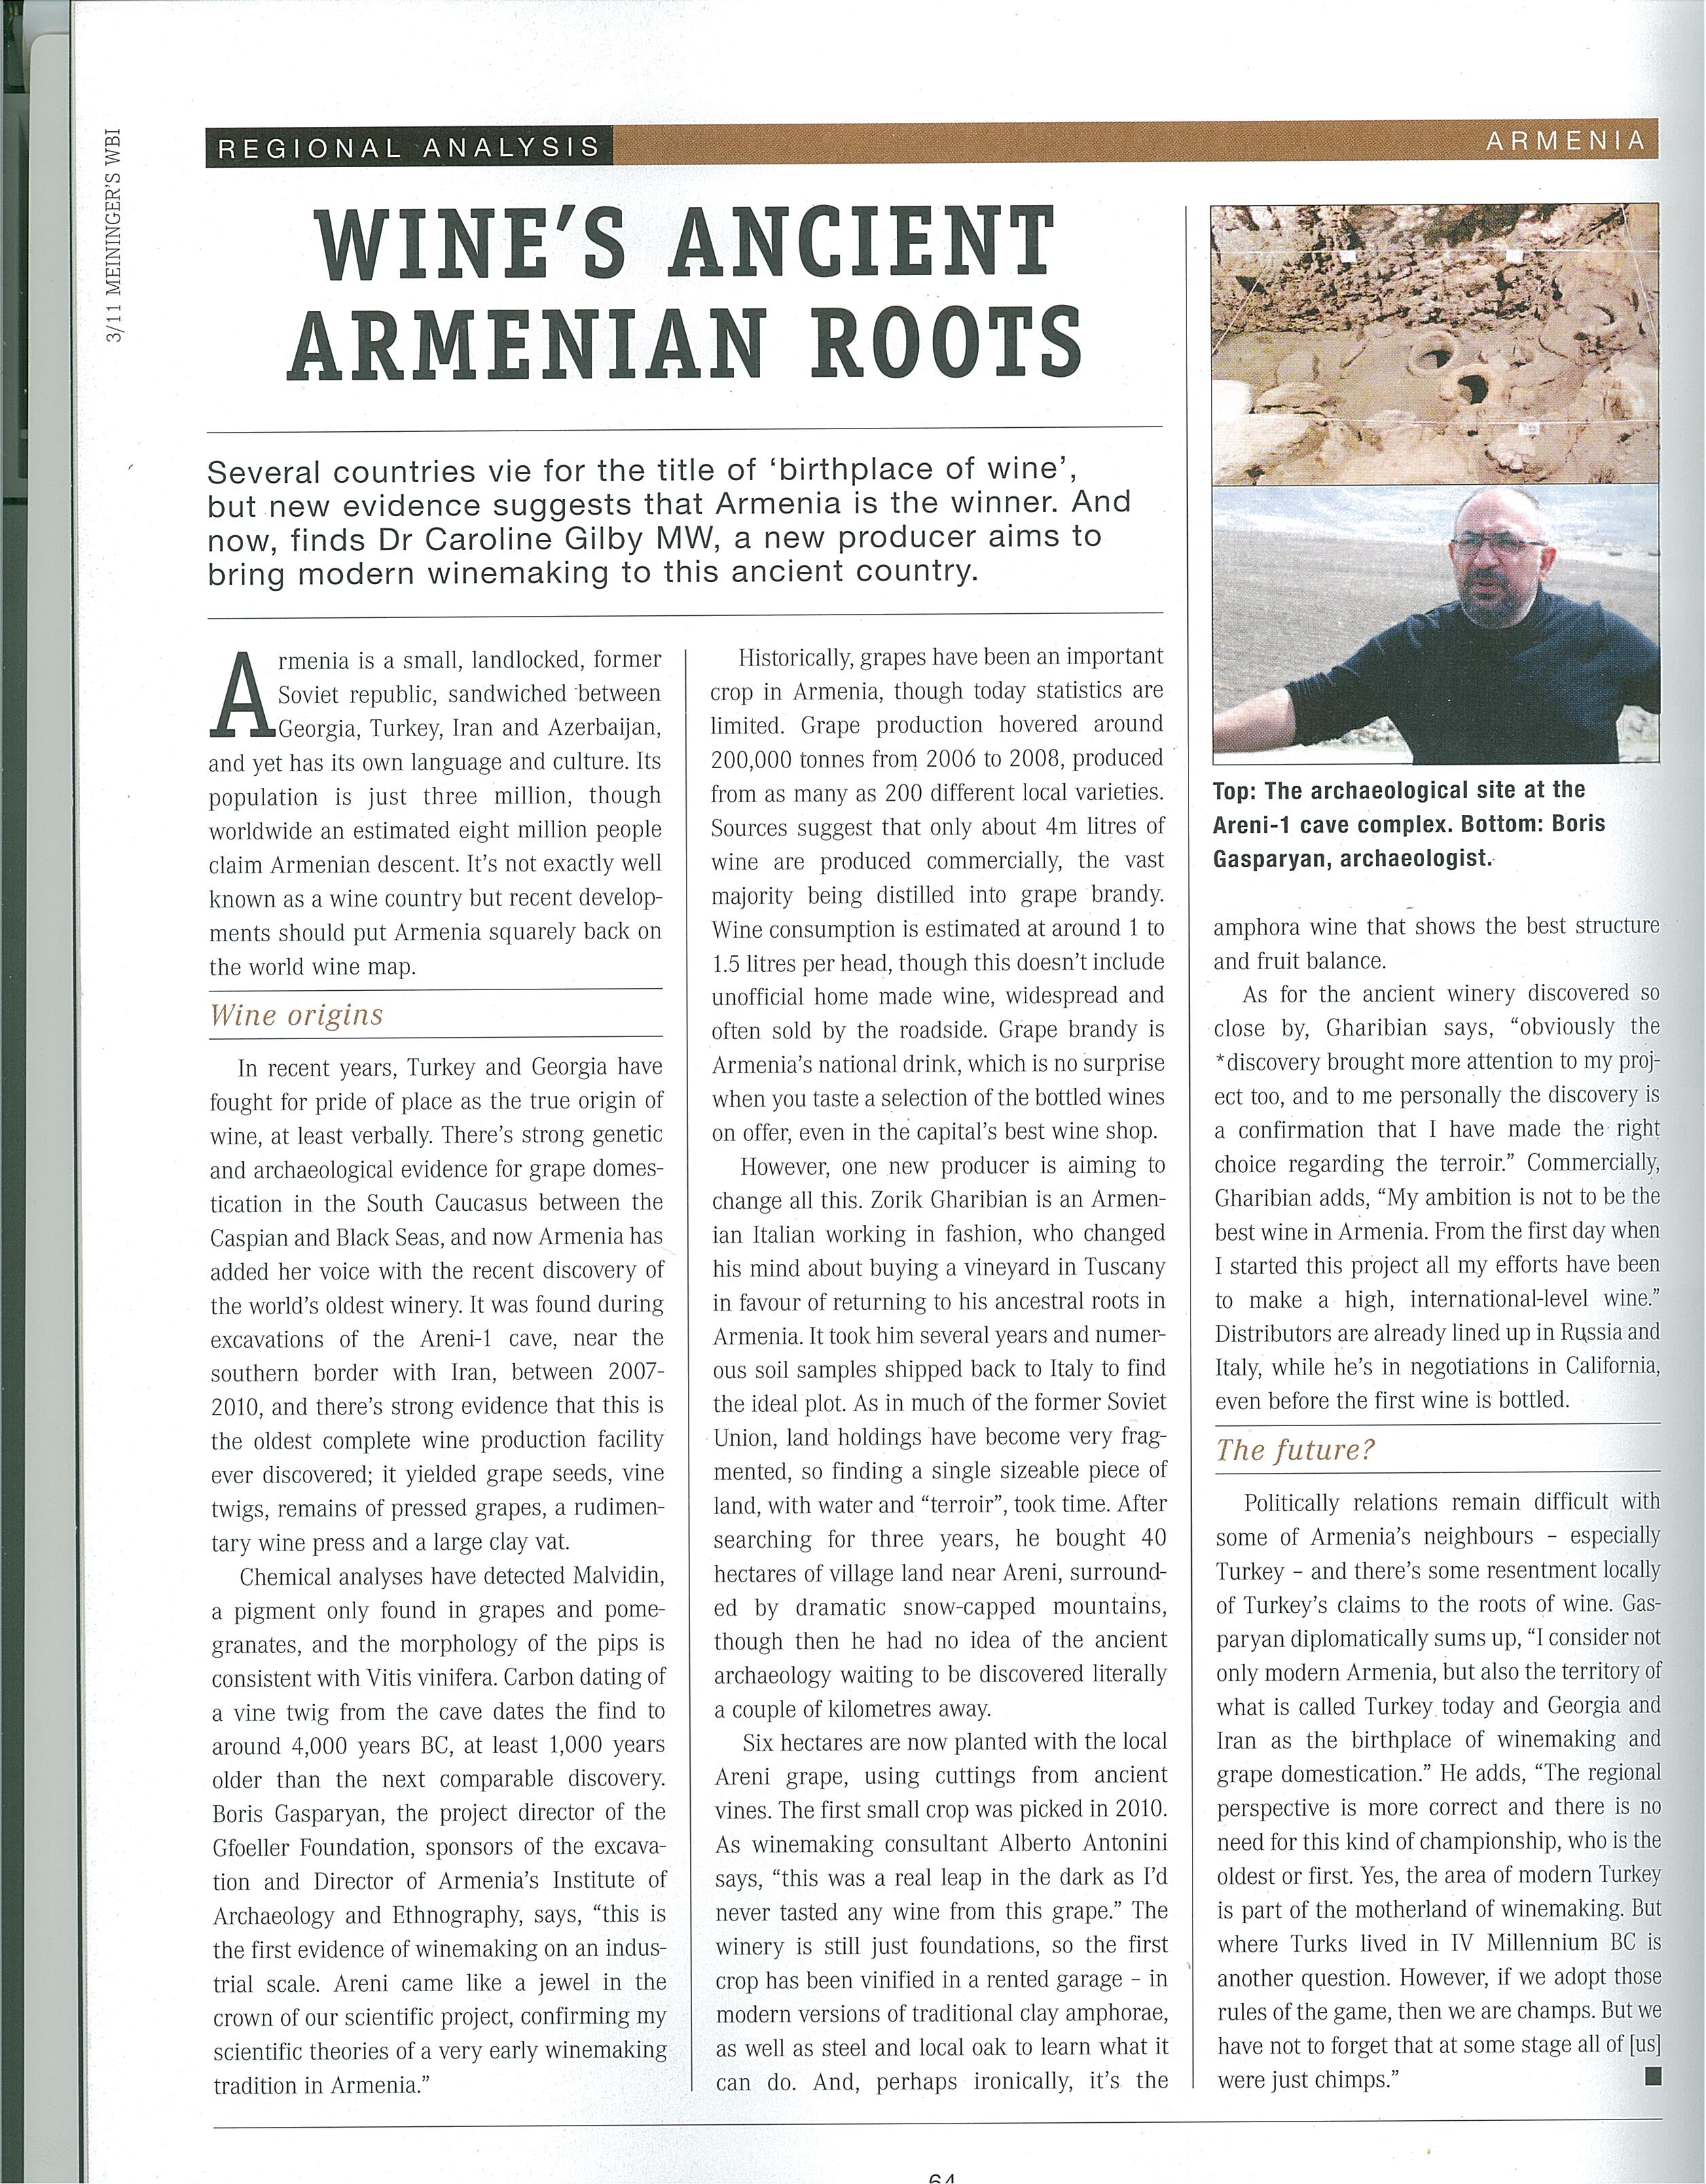 http://www.peopleofar.com/wp-content/uploads/armenia-wbi.jpe